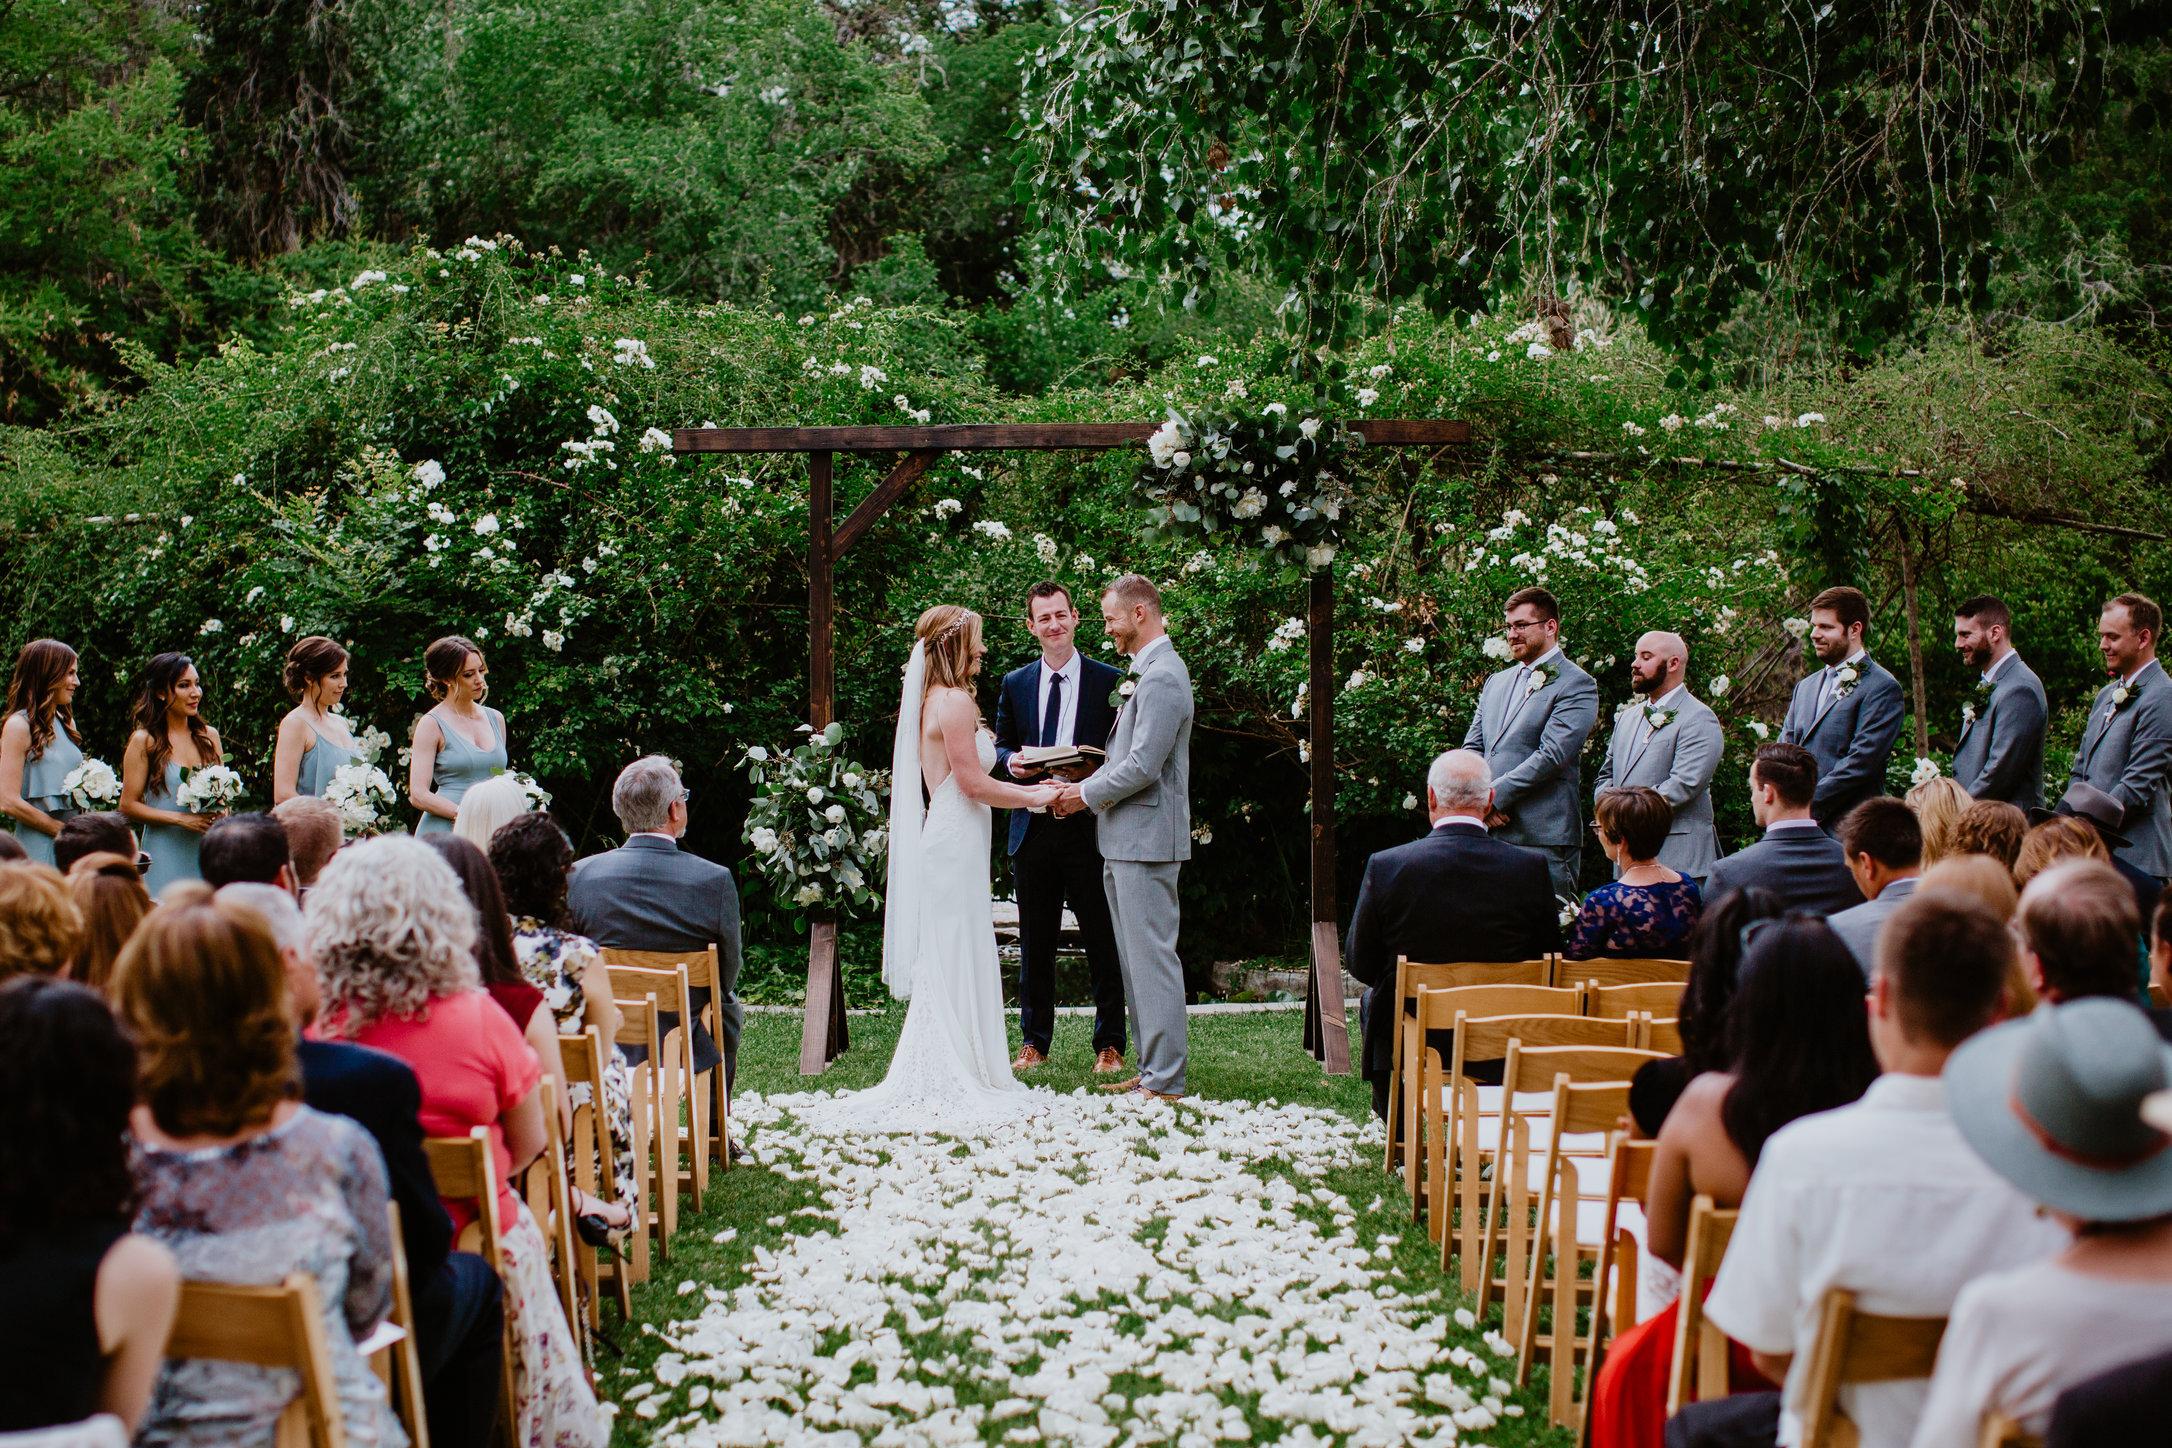 DandA-wedding-298.jpg